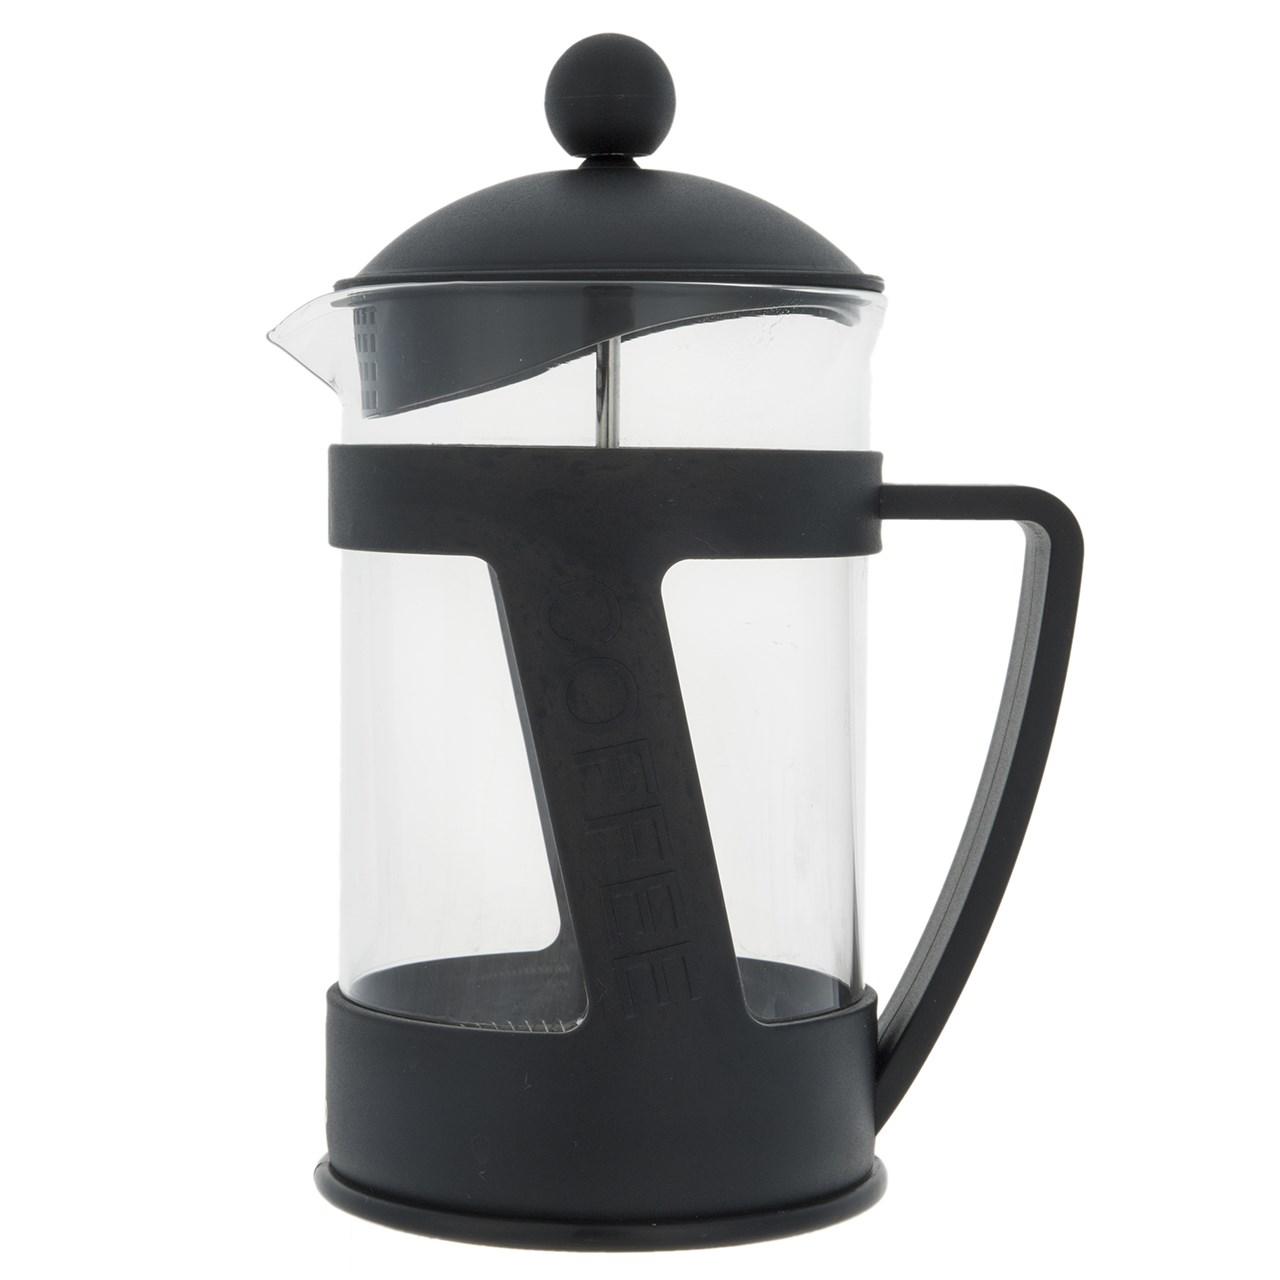 قهوه ساز سیلیو کد 345841